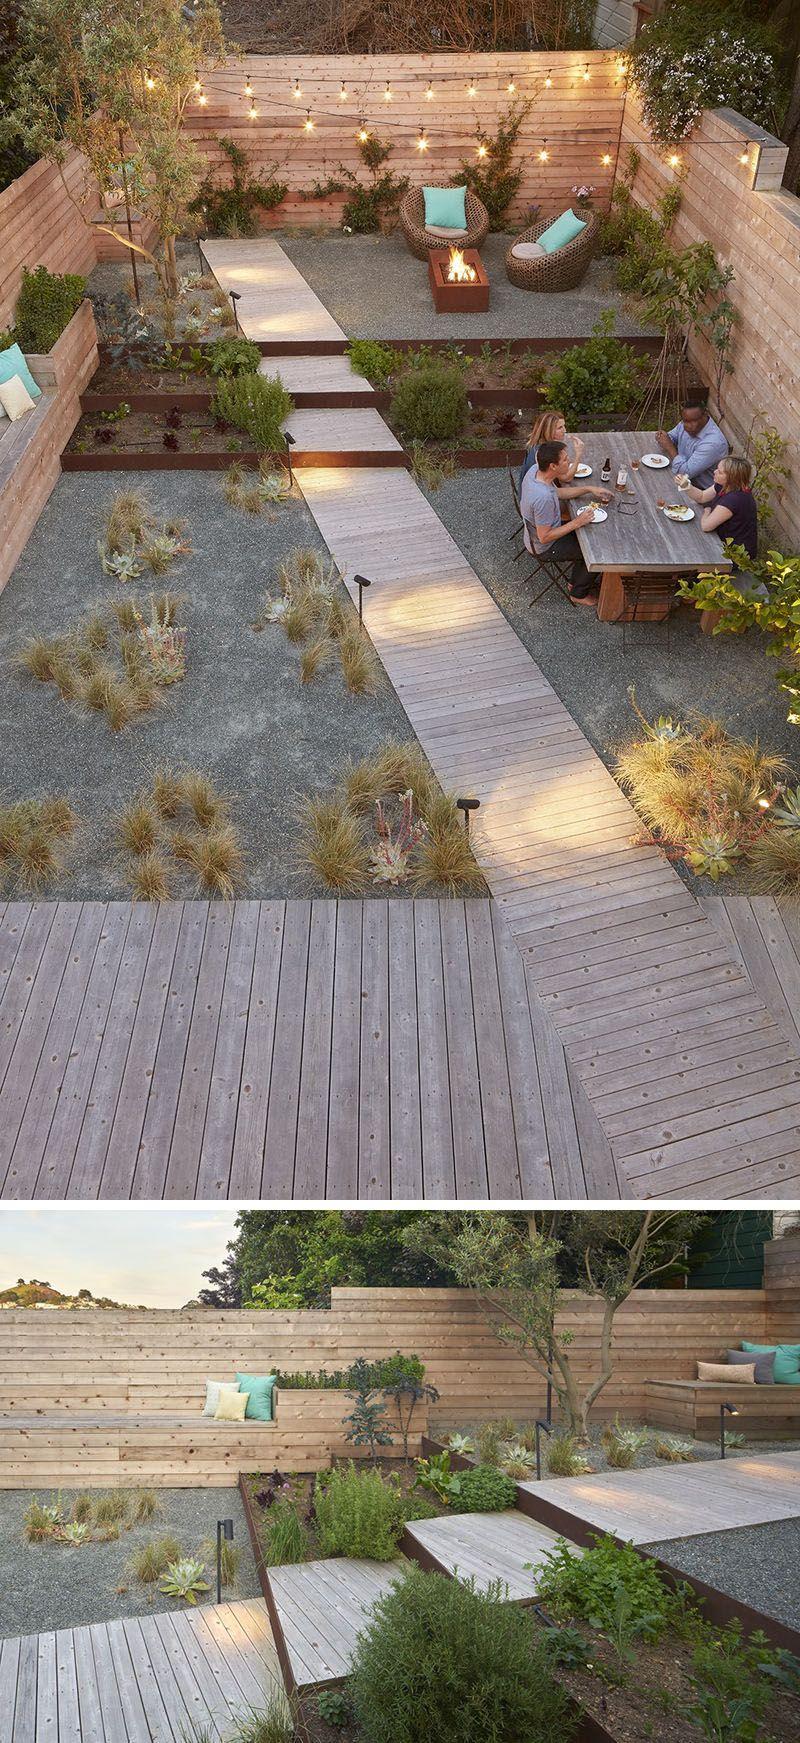 landscaping design ideas 11 backyards designed for entertaining